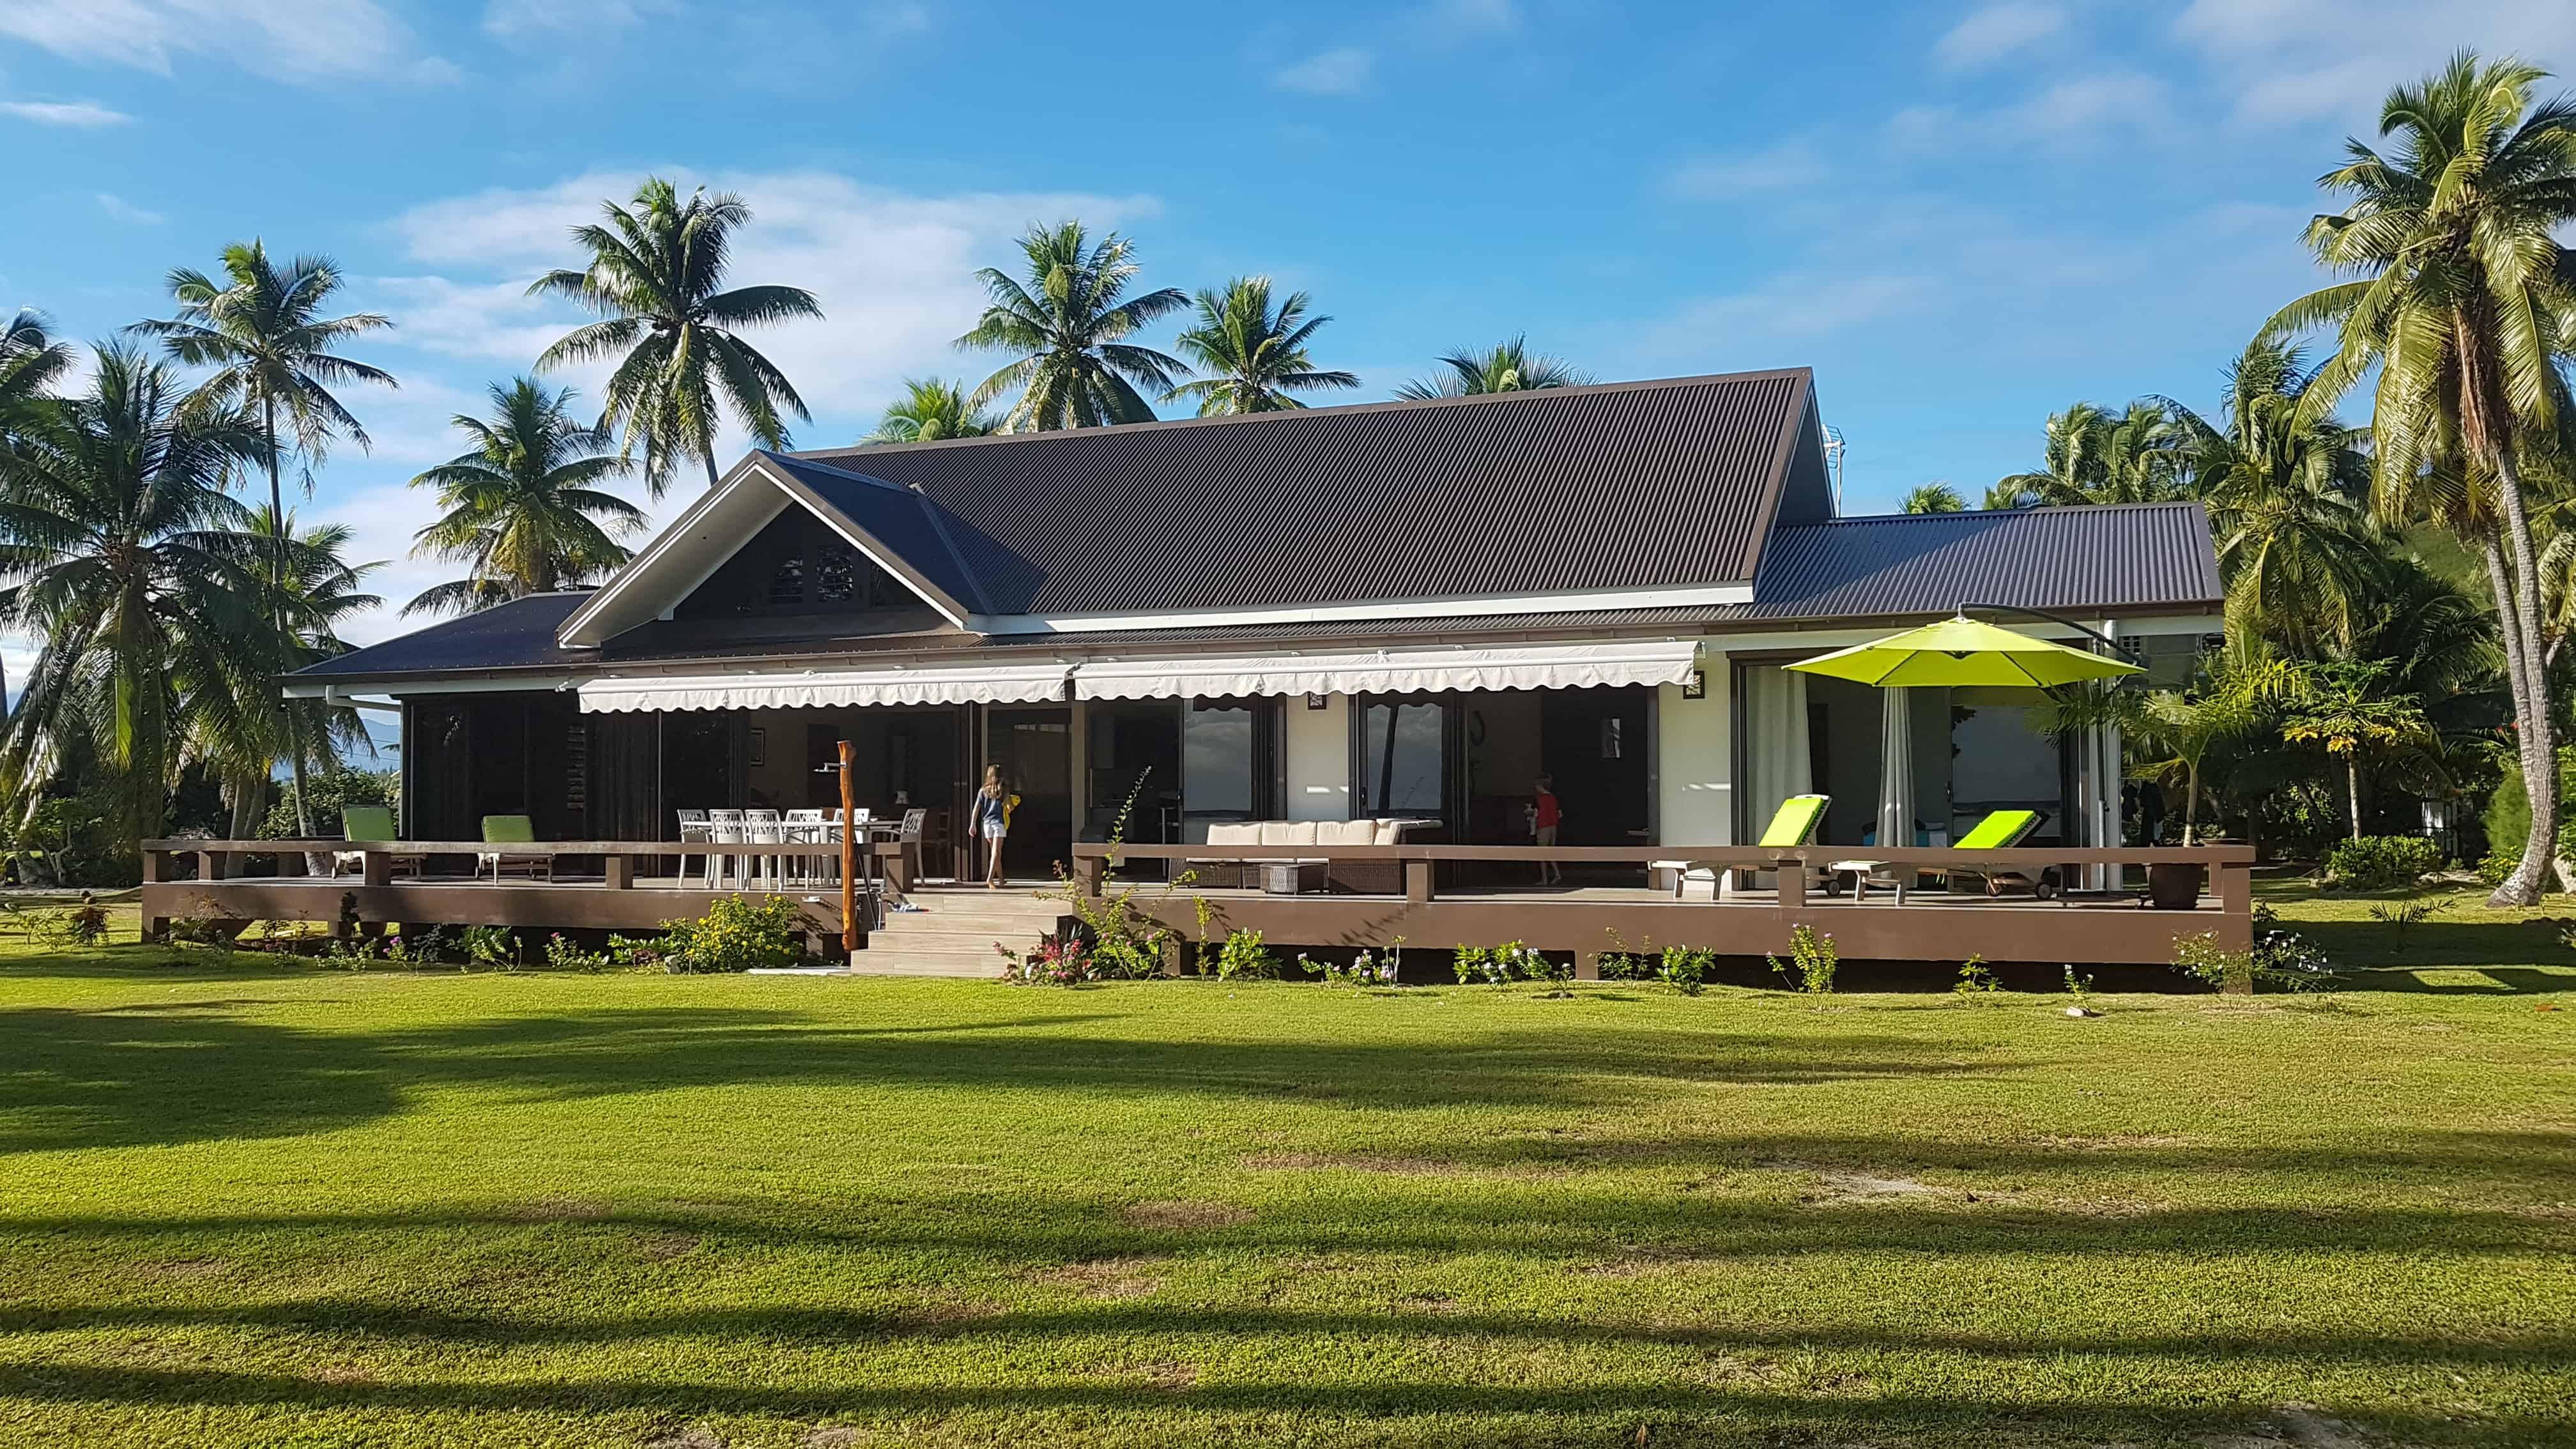 https://tahititourisme.es/wp-content/uploads/2018/09/Villa-Tiarenui-by-Tahiti-Homes-®-a-Moorea-4.jpg